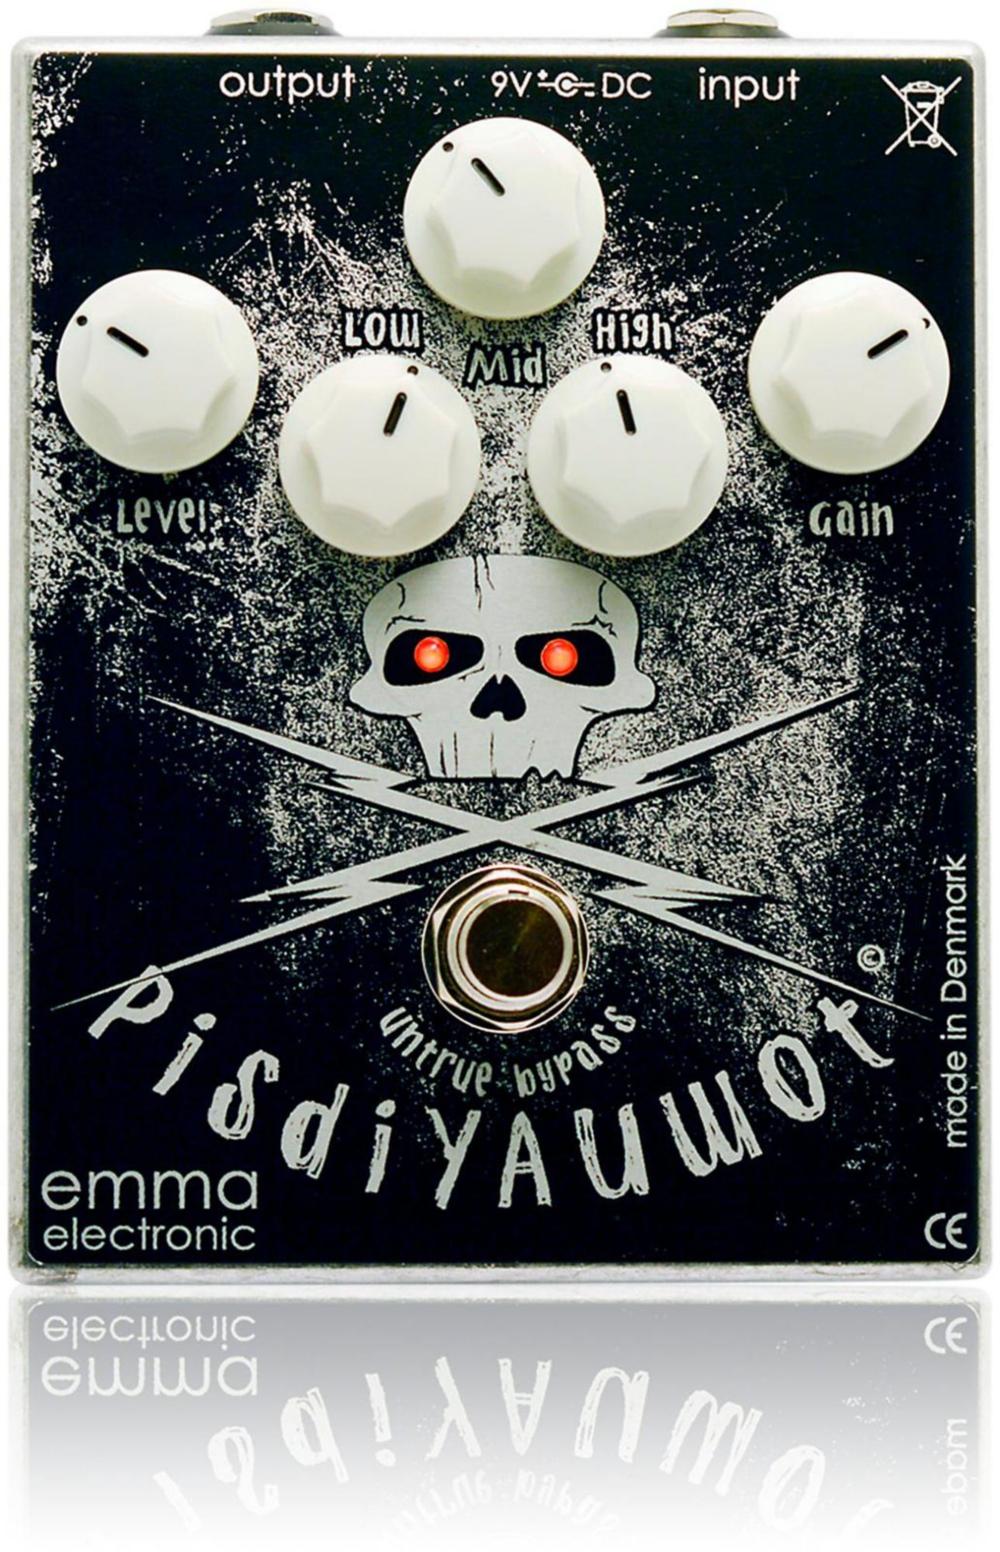 Emma Electronic PisdiYAUwot Metal Distortion Guitar Effects Pedal by Emma Electronic